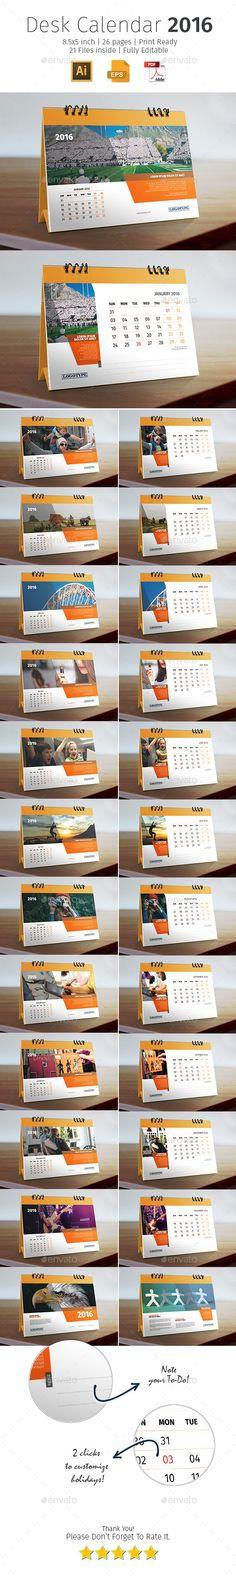 2016 Desk Calendar Template #design Download: http://graphicriver.net/item/2016-desk-calendar/12604827?ref=ksioks